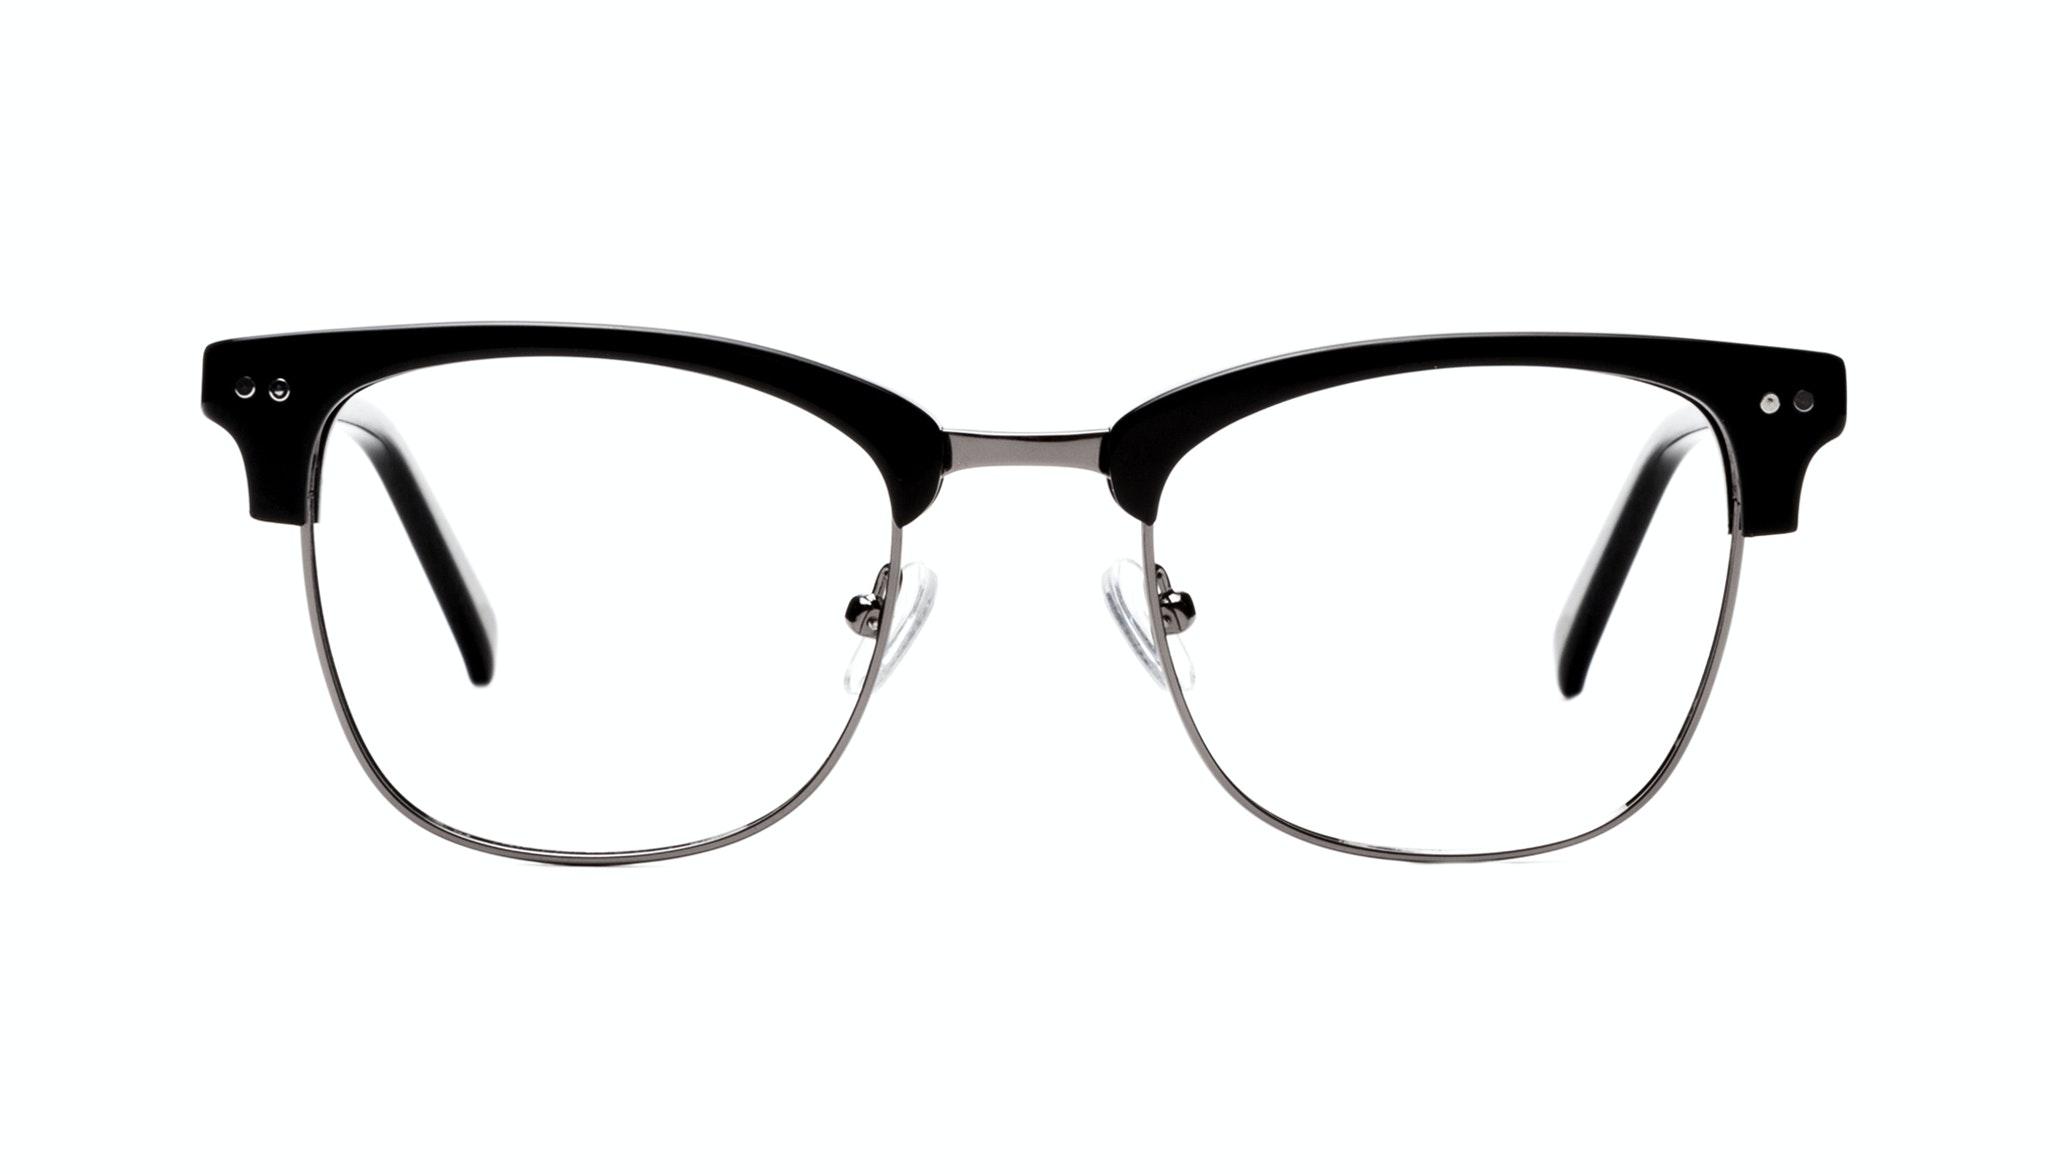 Affordable Fashion Glasses Square Eyeglasses Men Lift Onyx Front